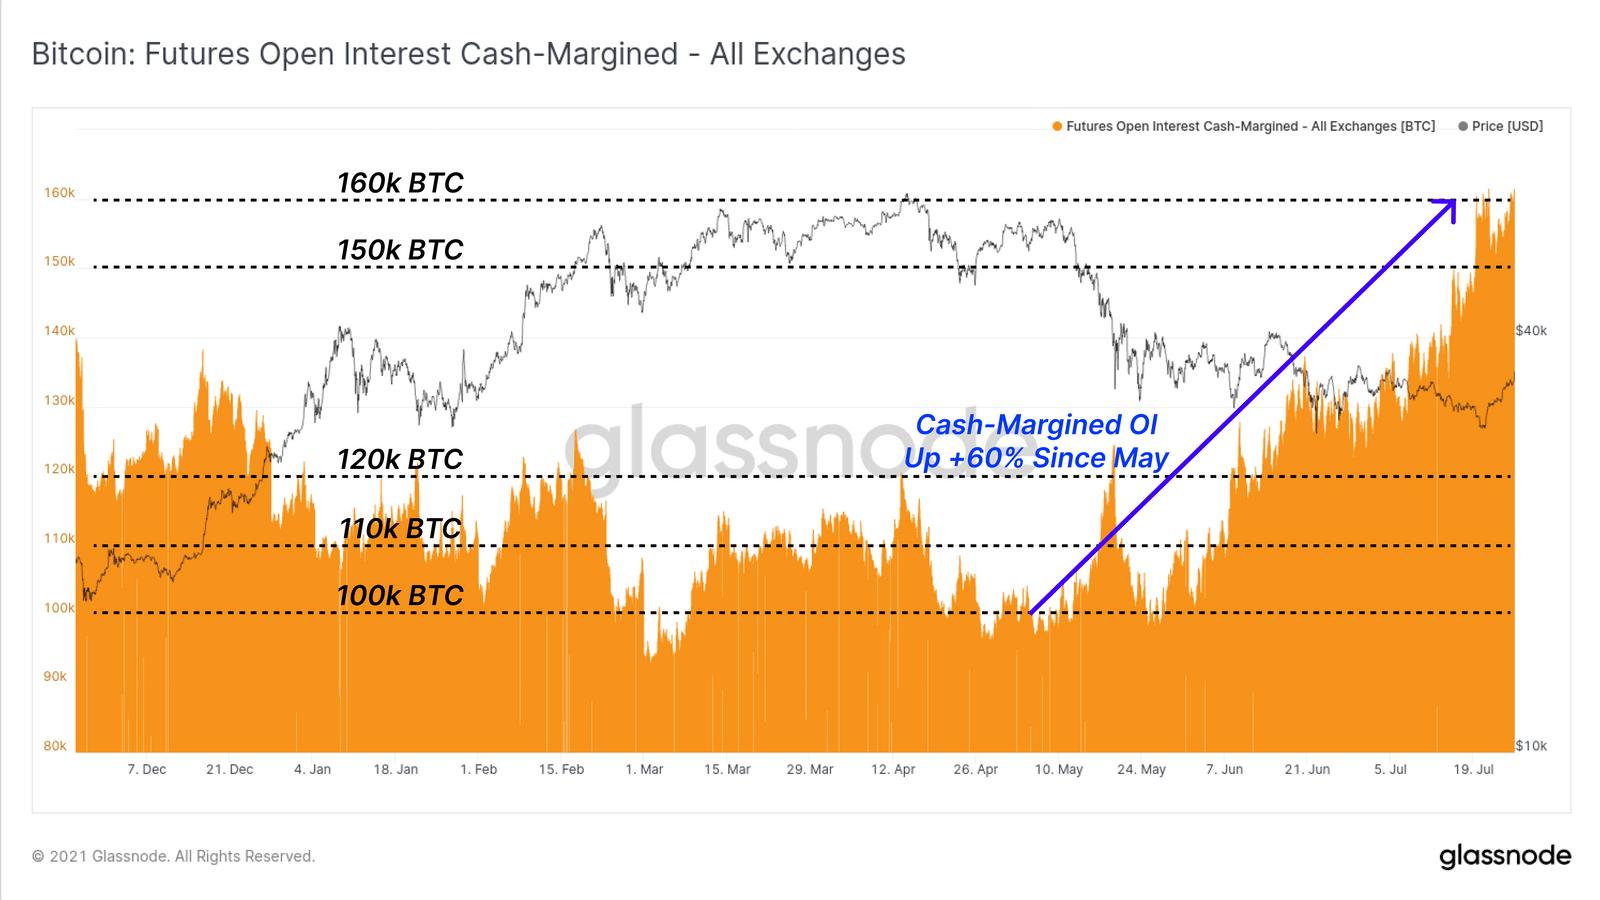 Open Interest in Cash-Margin